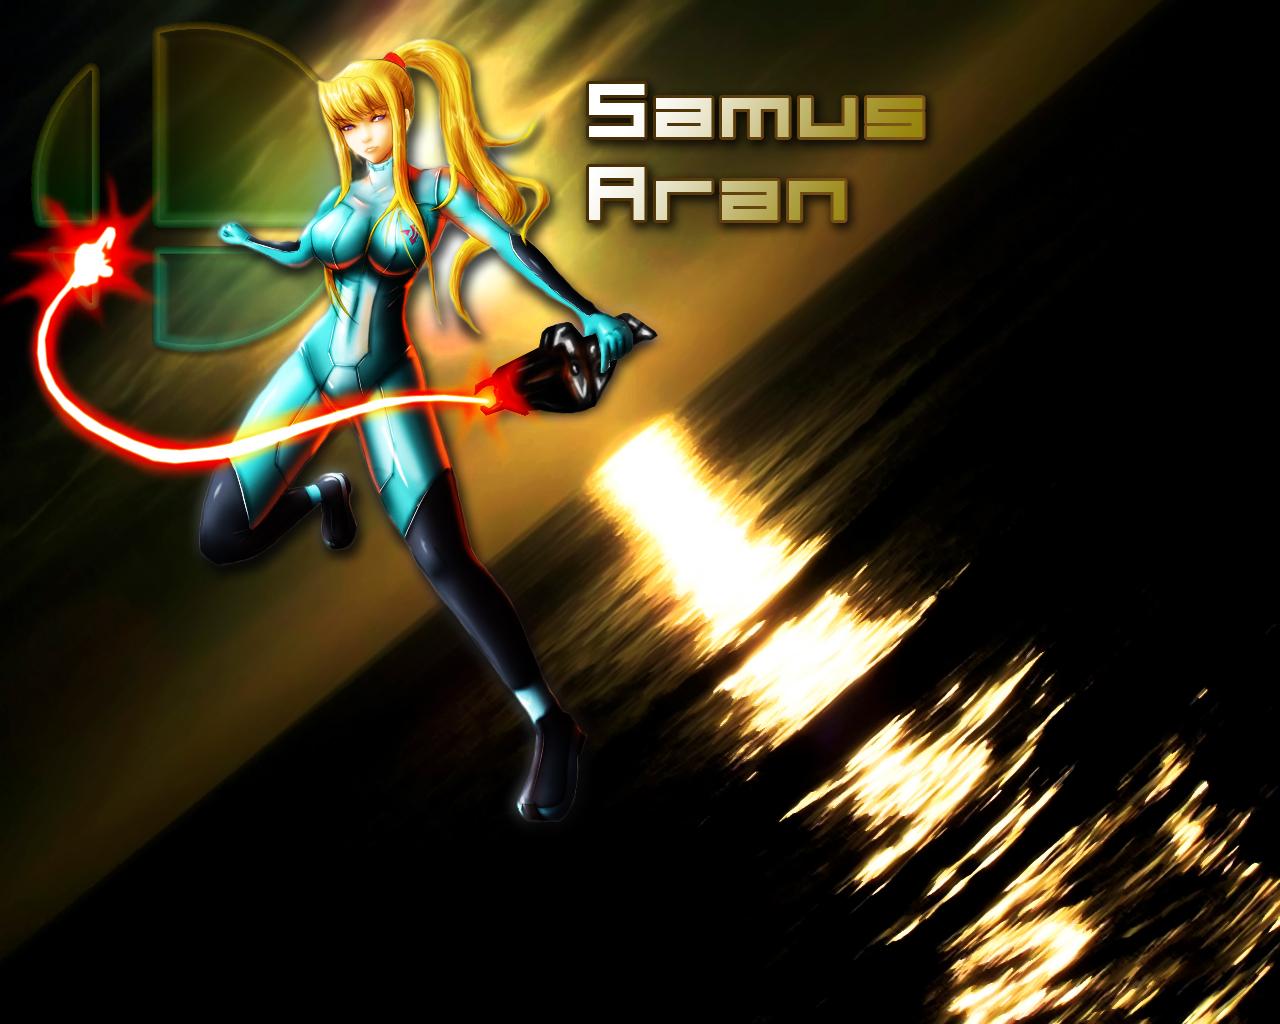 samus aran wallpaper by paranoia290 on deviantart